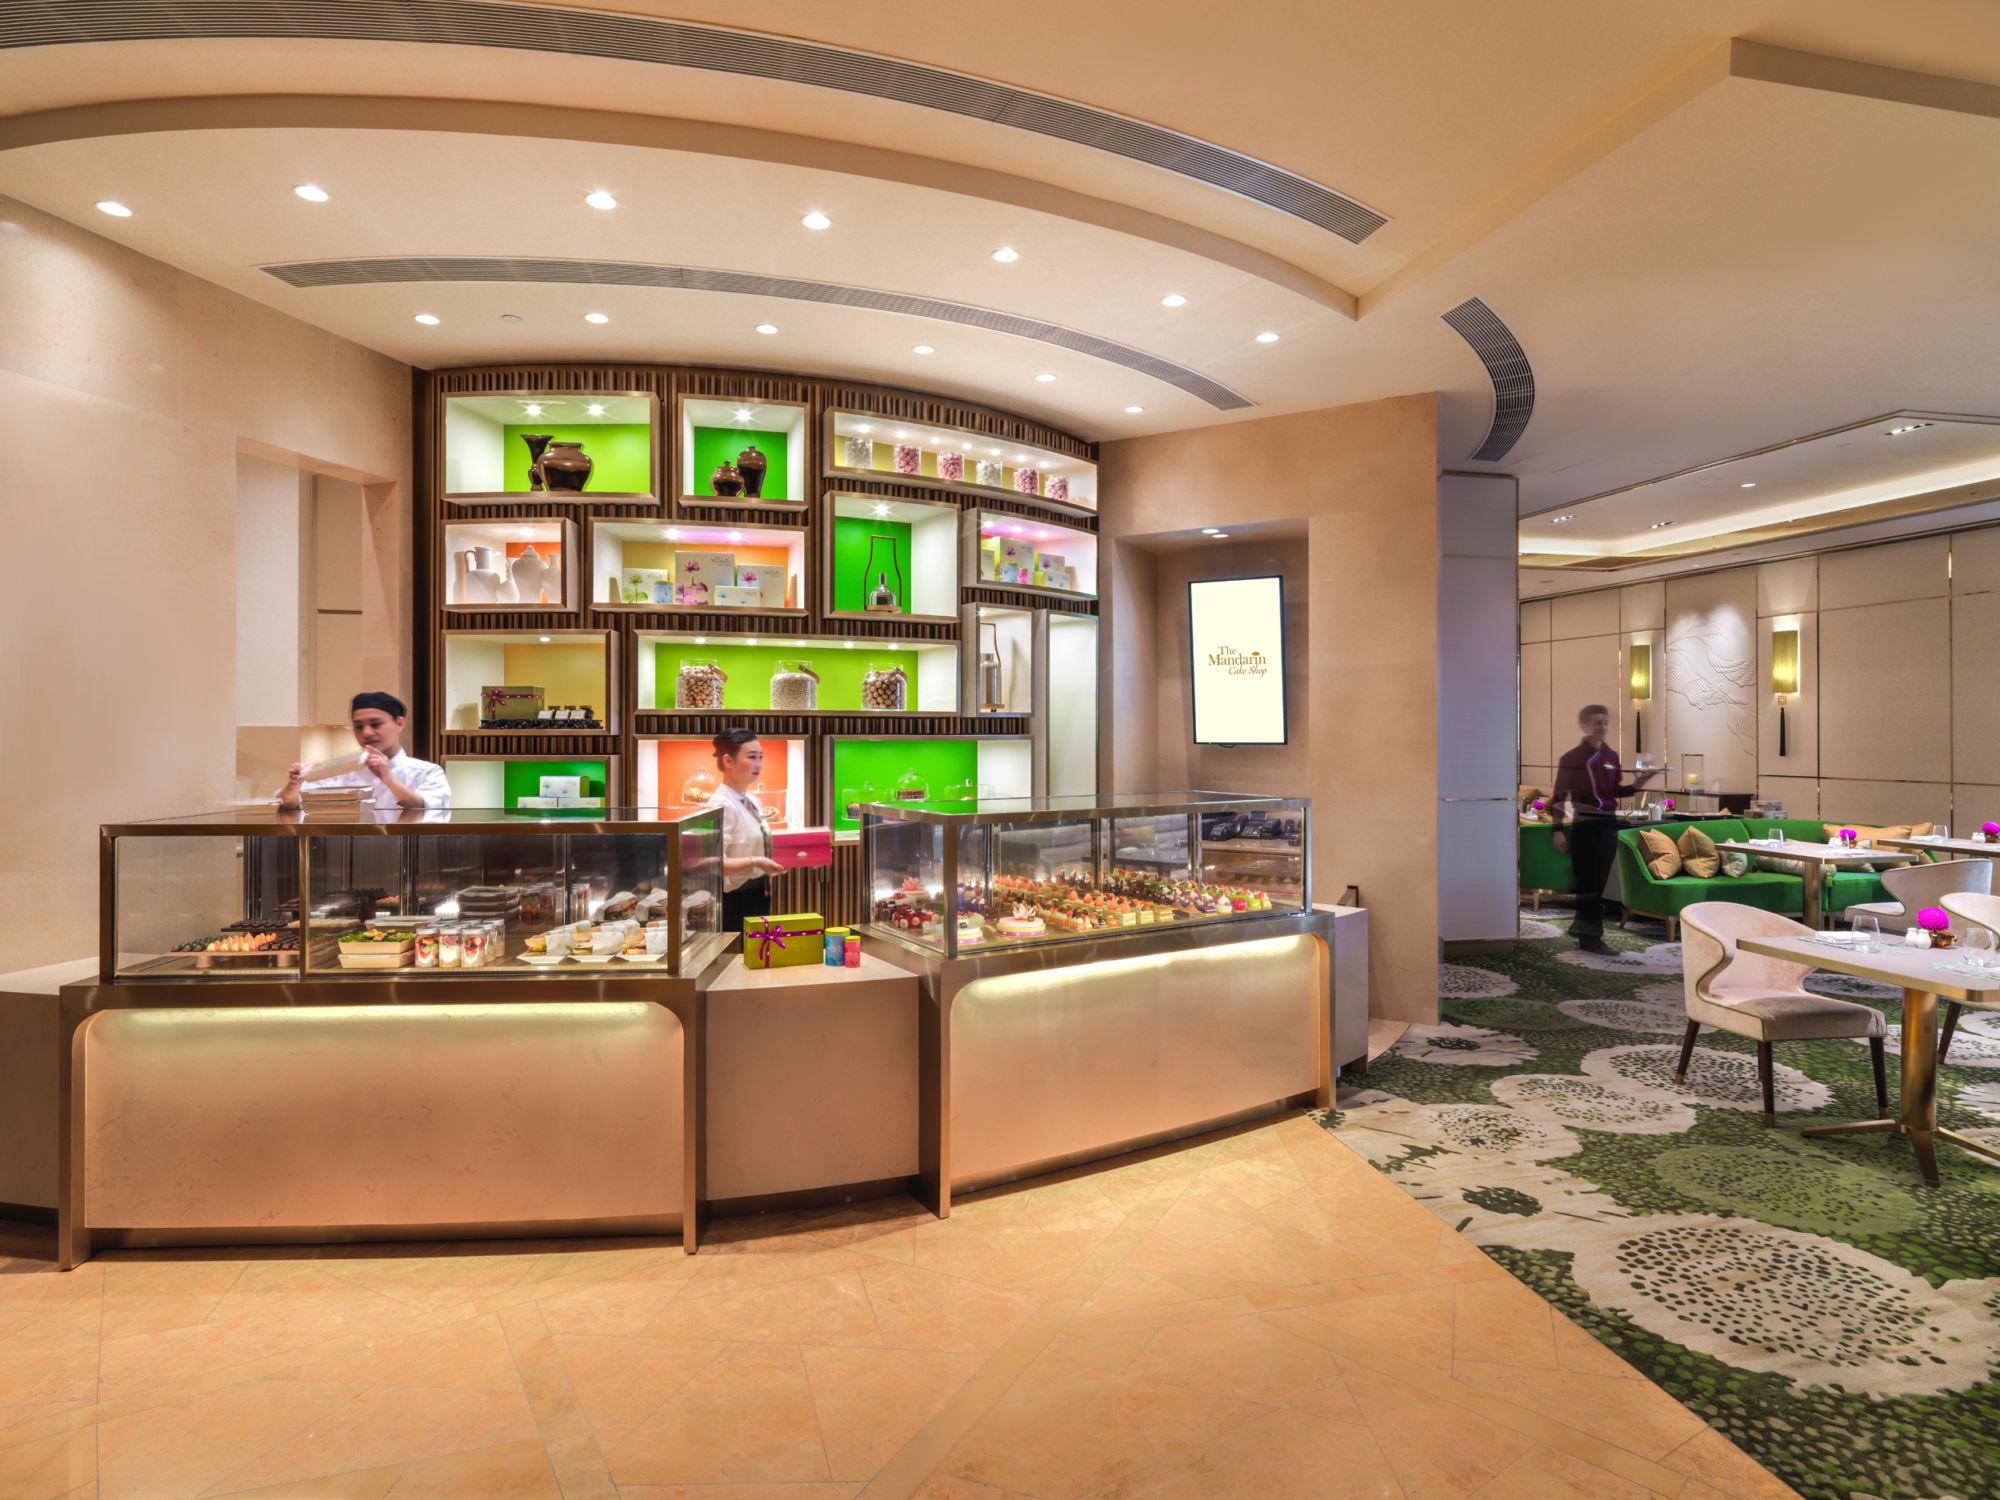 Macau_The Mandarin Cake Shop Exterior